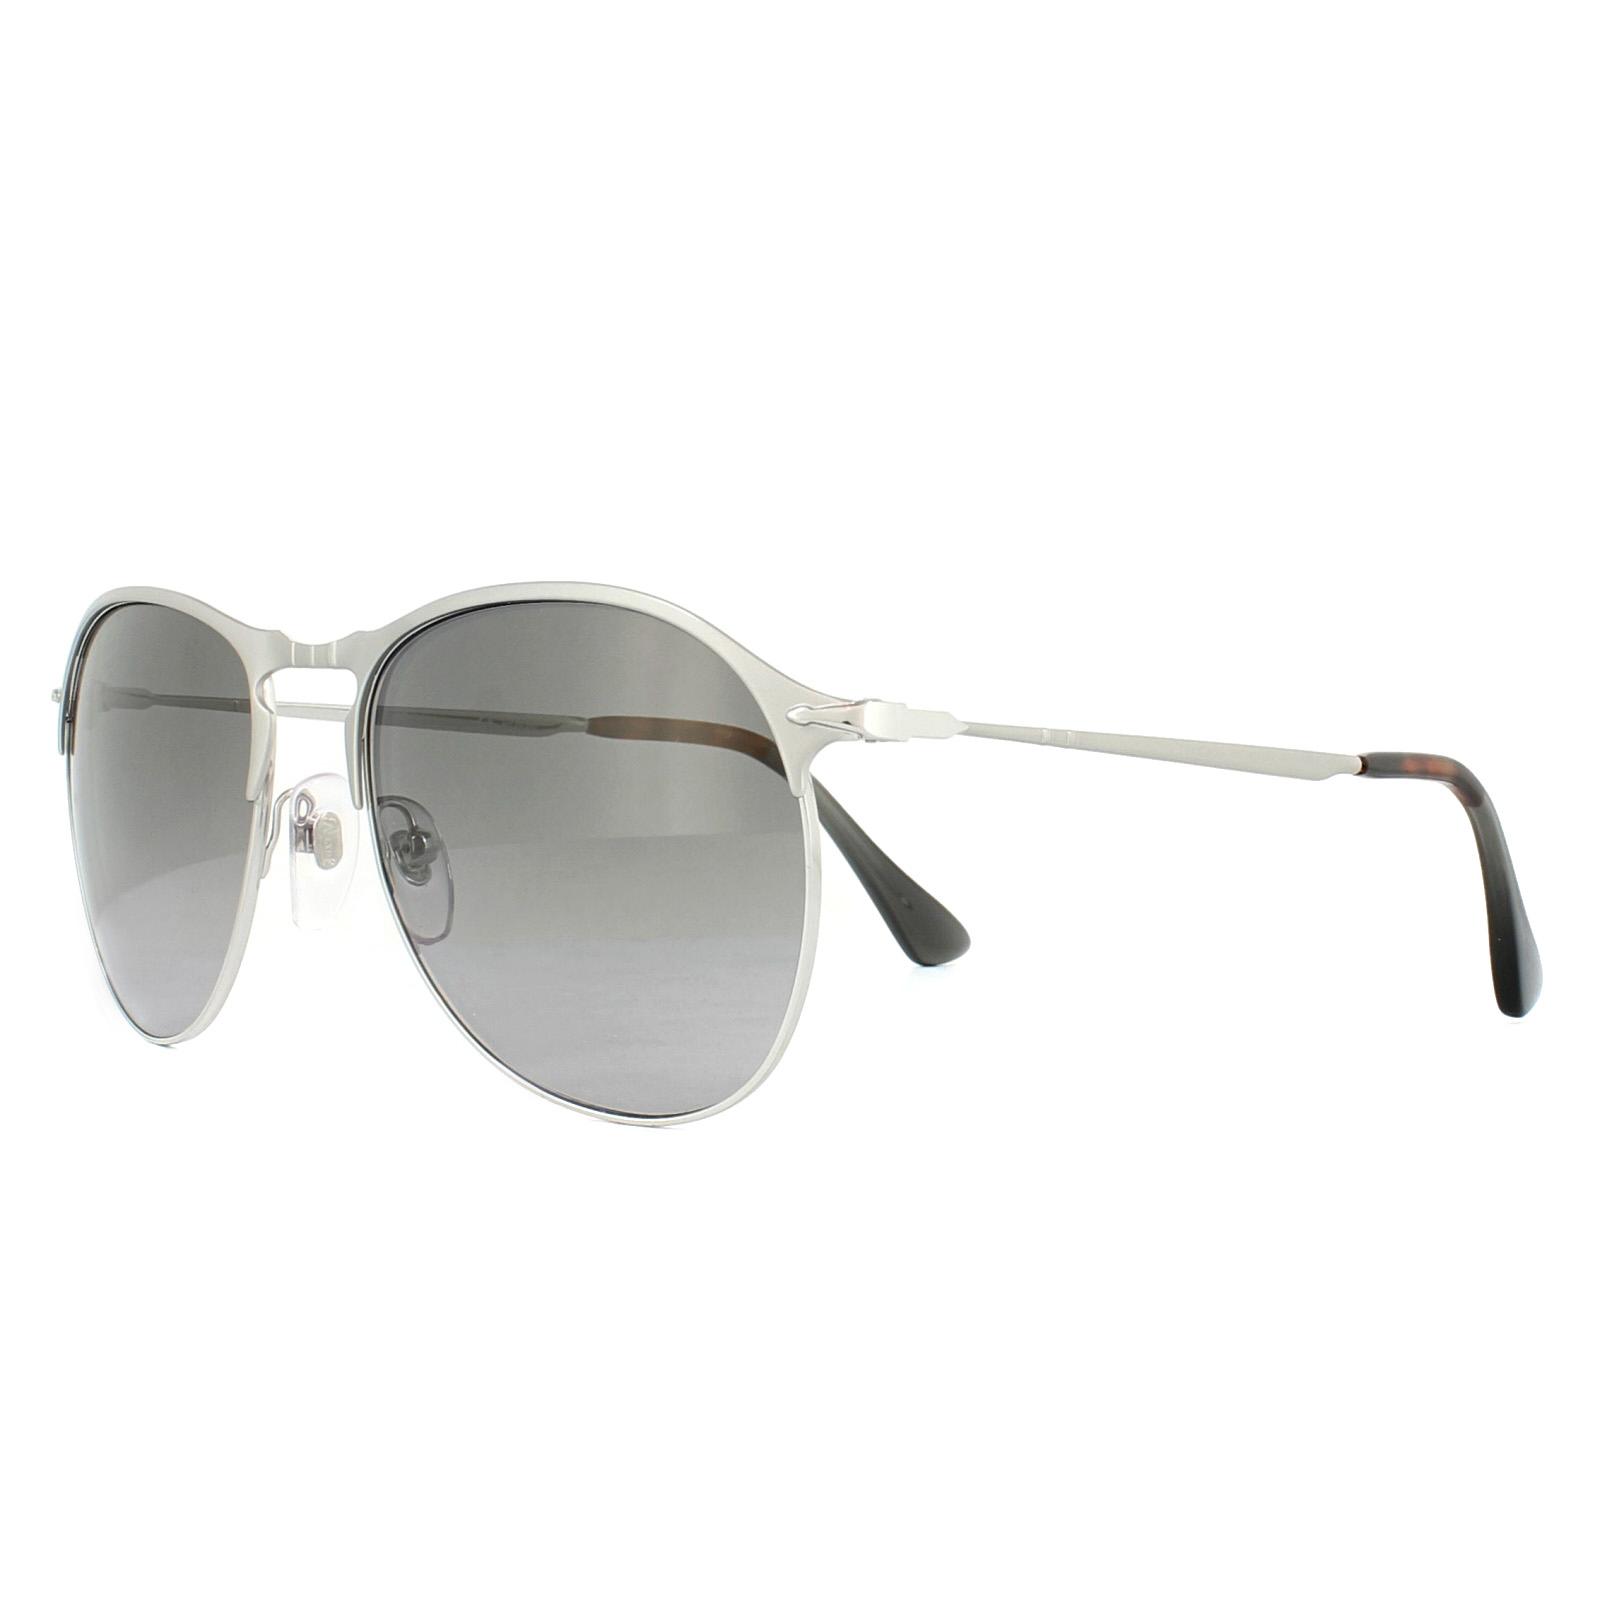 d0a63dbd28 Sentinel Persol Sunglasses 7649S 1068M3 Matt Silver Green Gradient Polarized